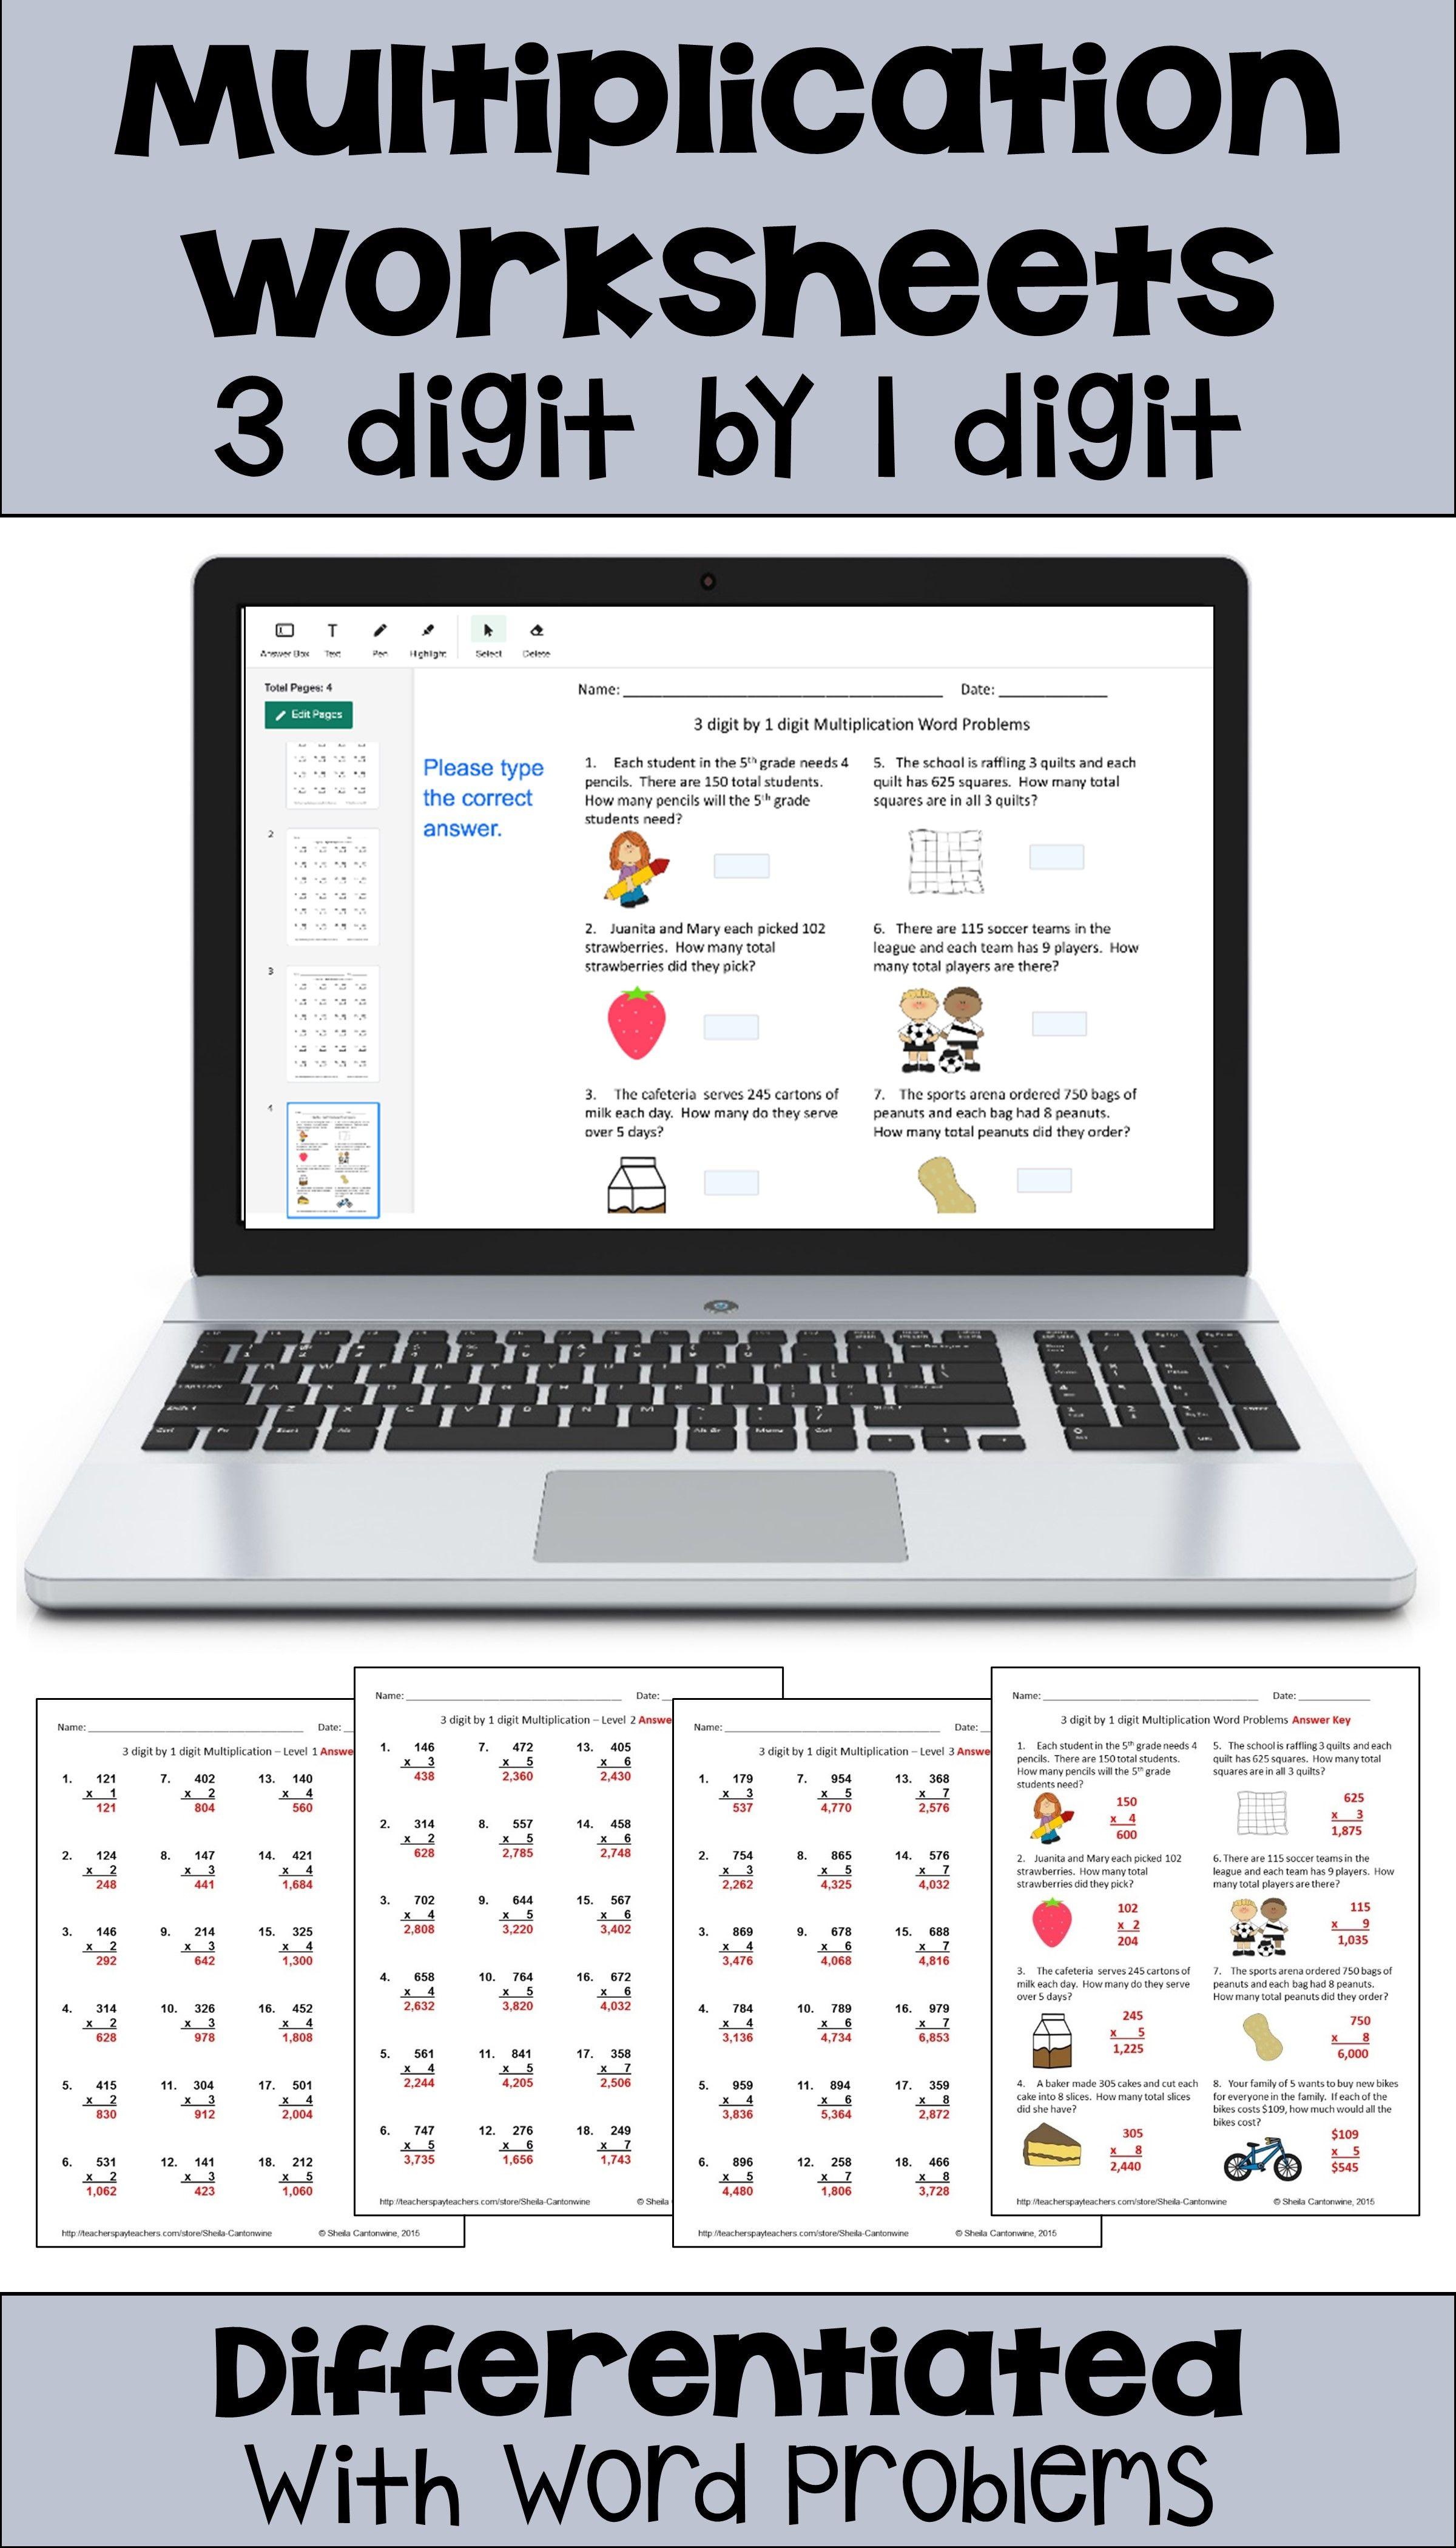 Multiplication Worksheets 3 Digit By 1 Digit With Digital